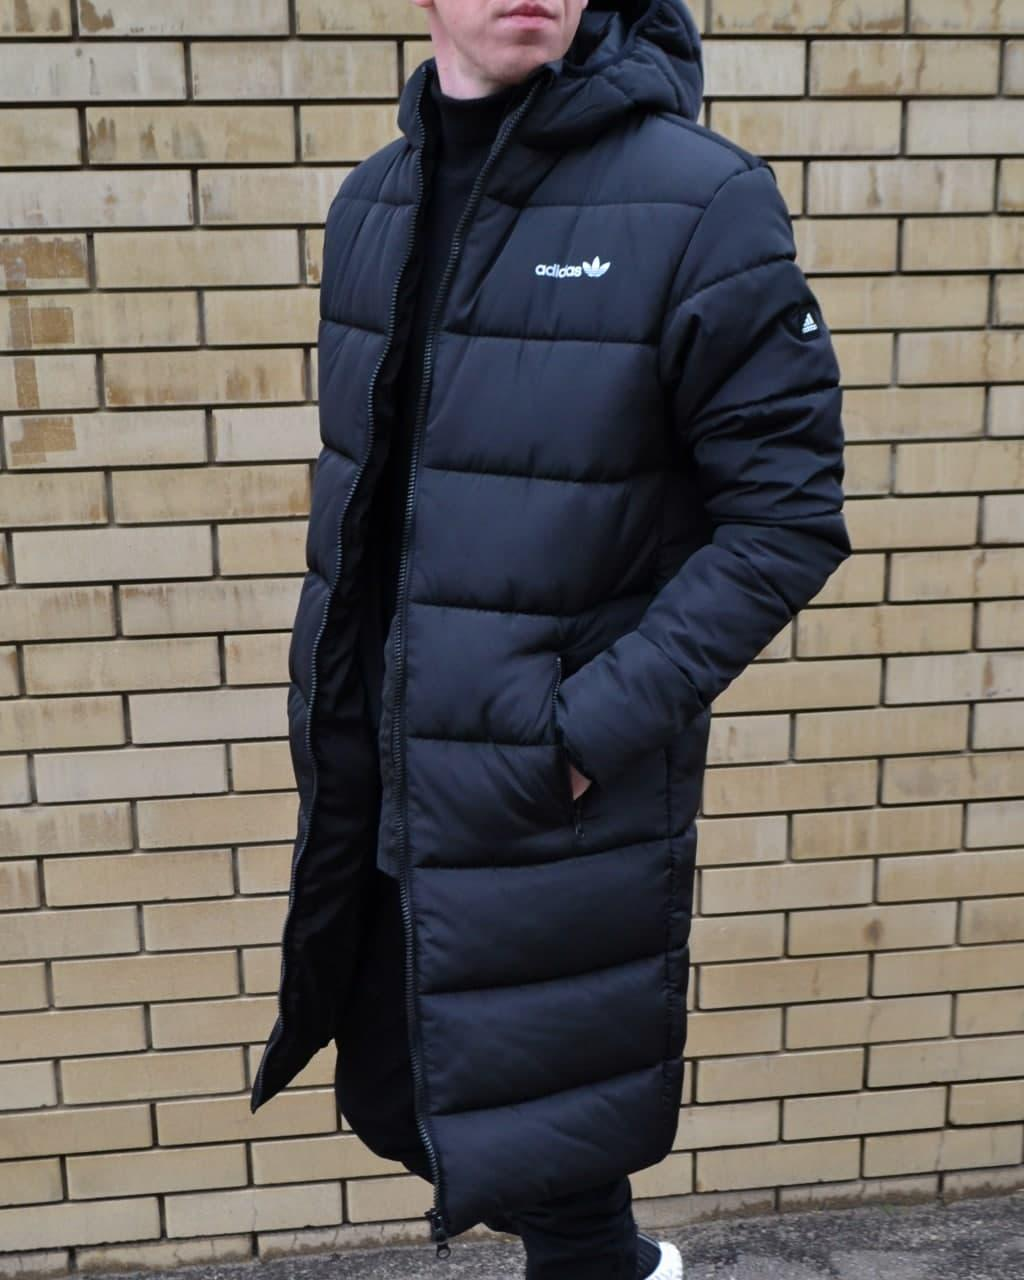 Зимняя мужская куртка длинная парка Адидас (Adidas) футбольная куртка